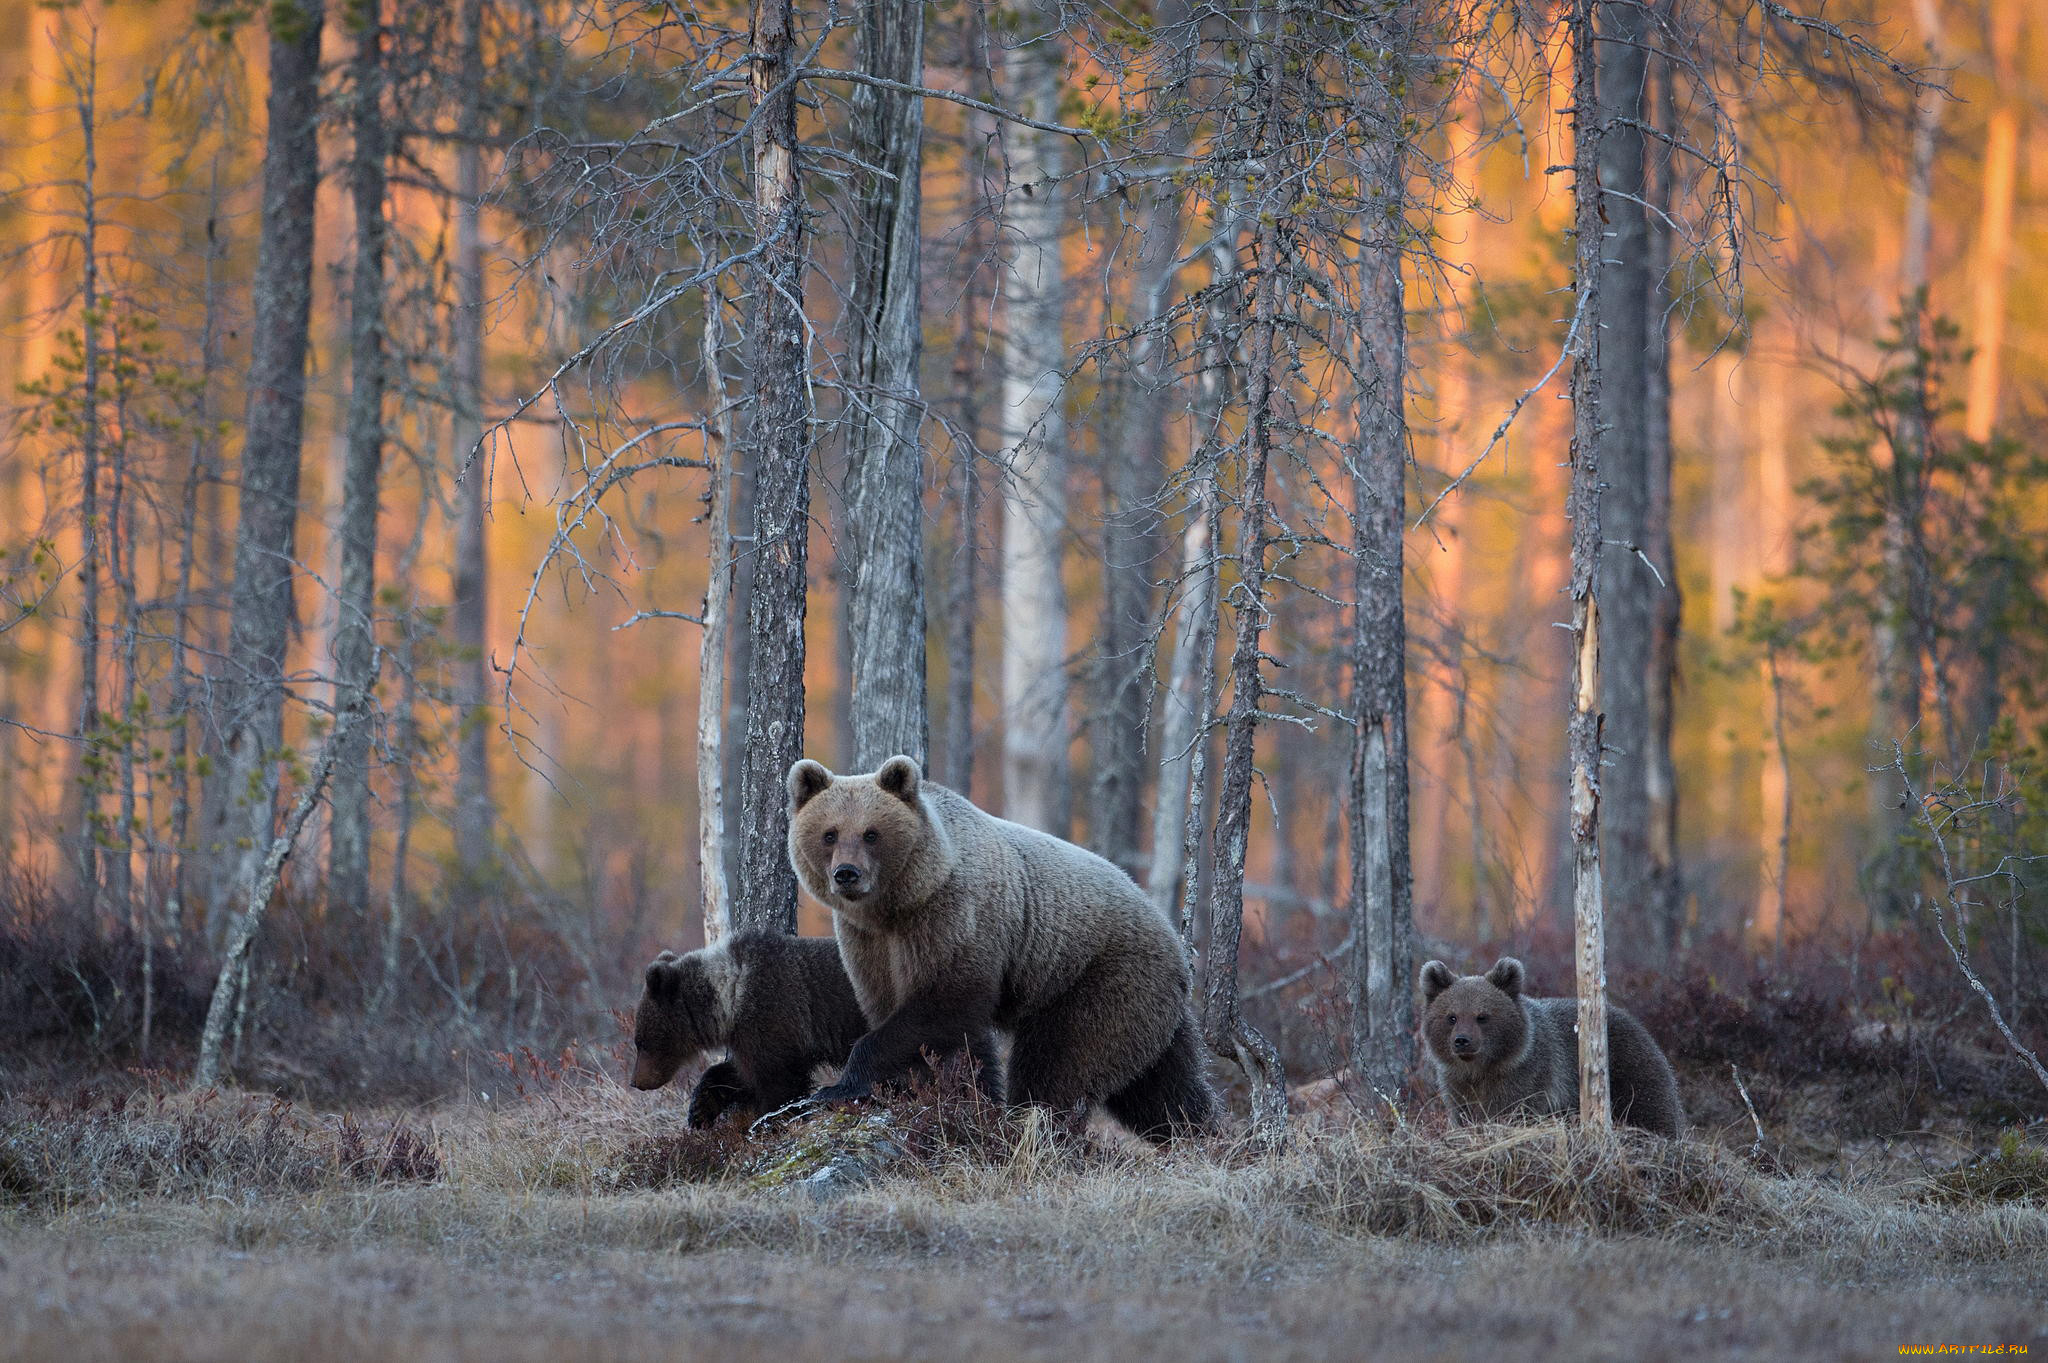 они медведи картинки большого формата вадимом познакомились